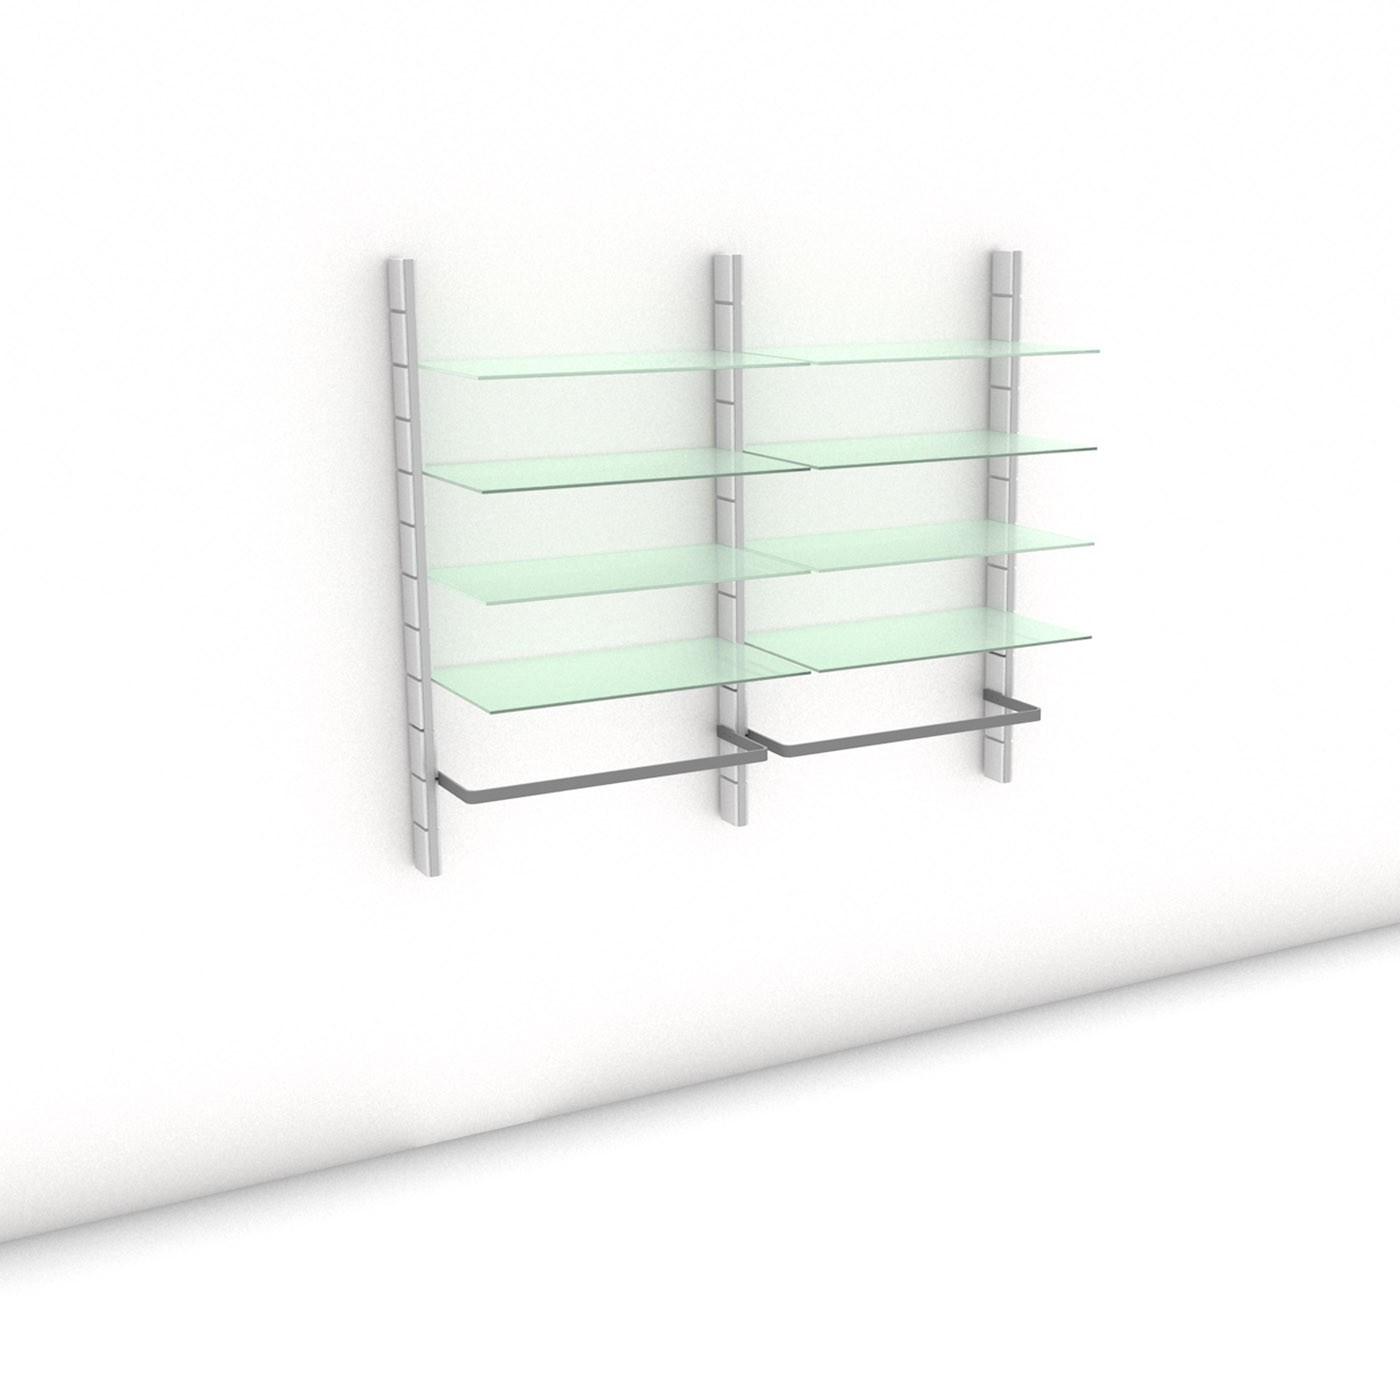 Begehbarer Kleiderschrank - Prime (L) 164 - Maß: 164 x 143,2 x 45 cm (B x H x T)